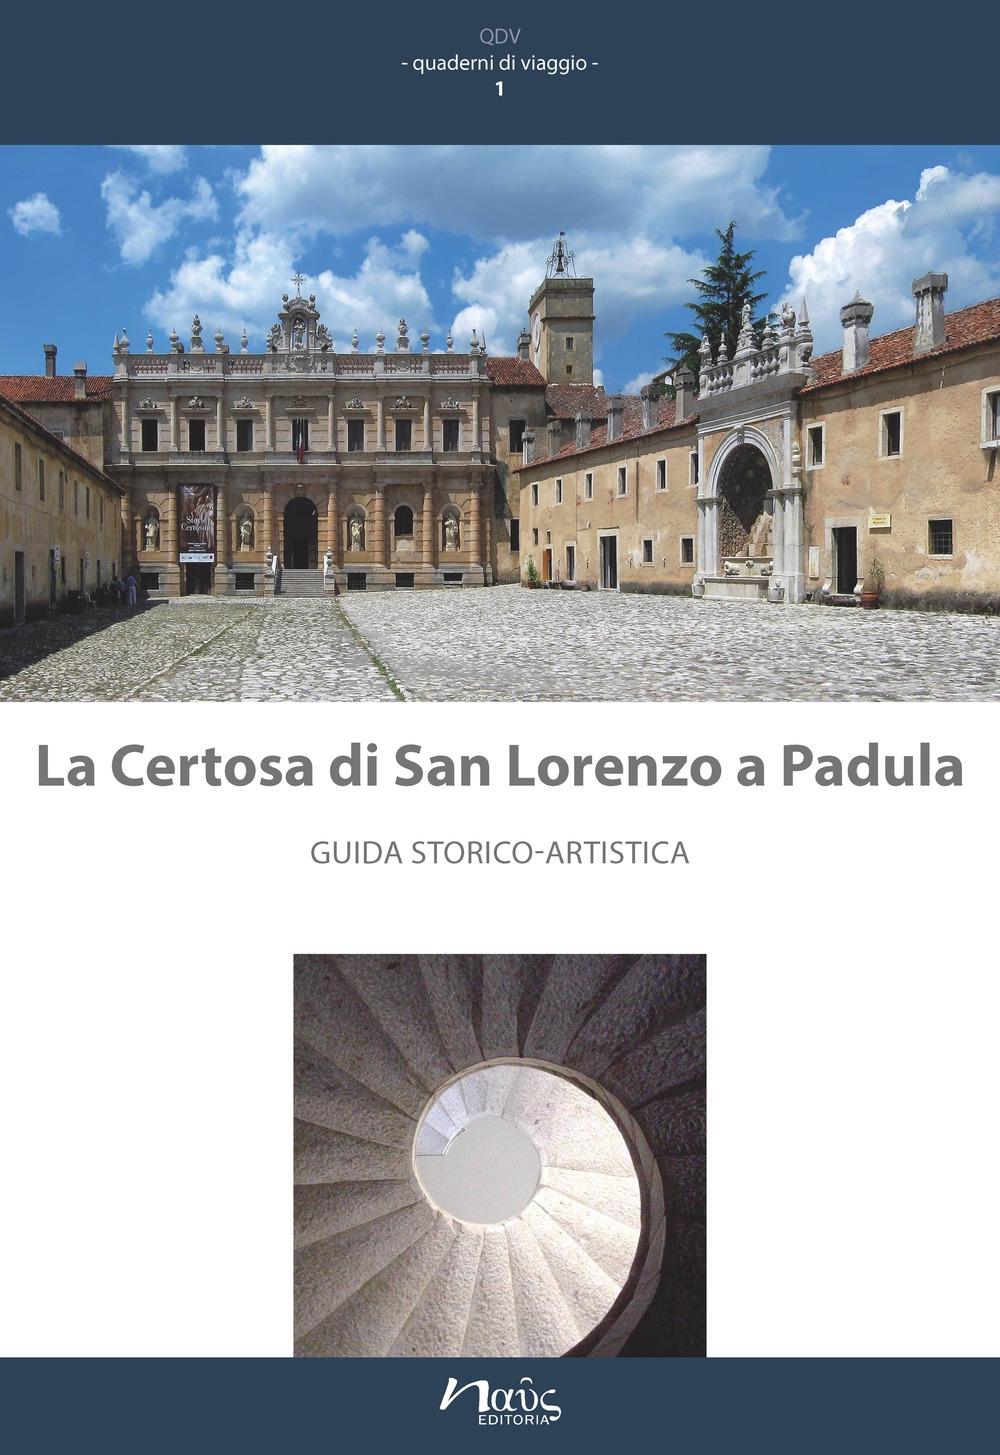 La Certosa di San Lorenzo a Padula. Guida Storico-Artistica.